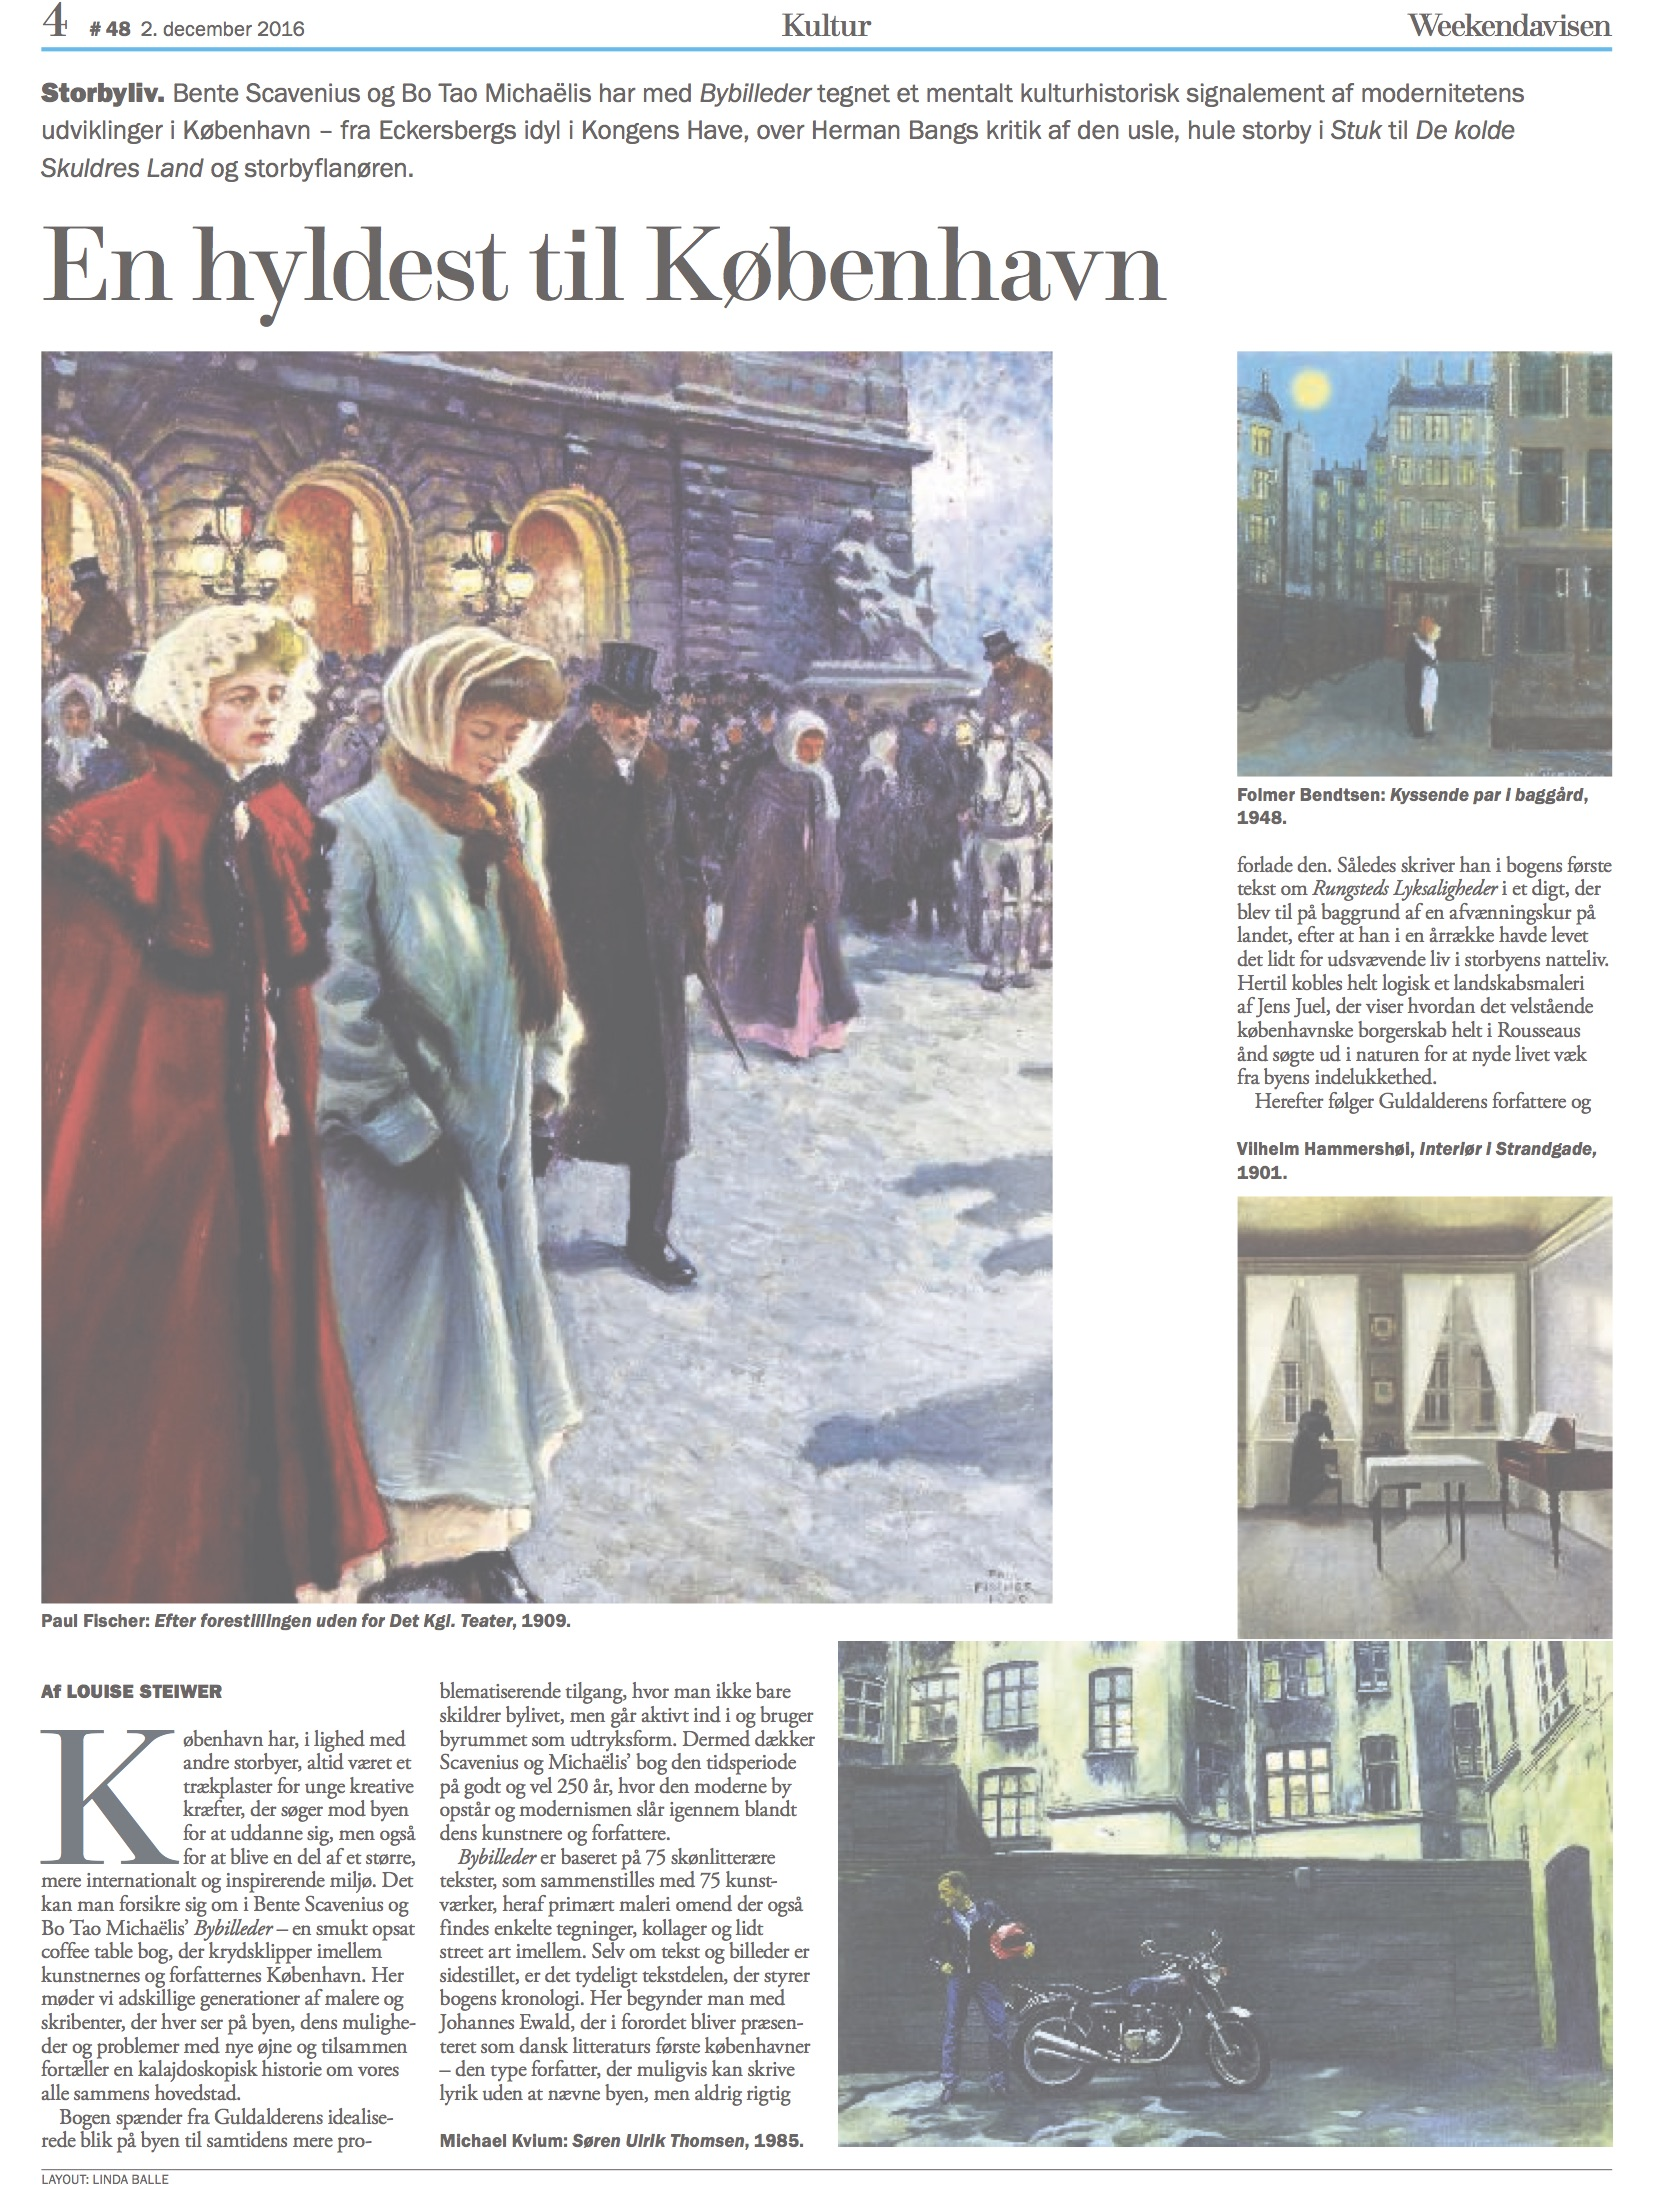 Anm_ En hyldest til København (e6024258) Strandberg